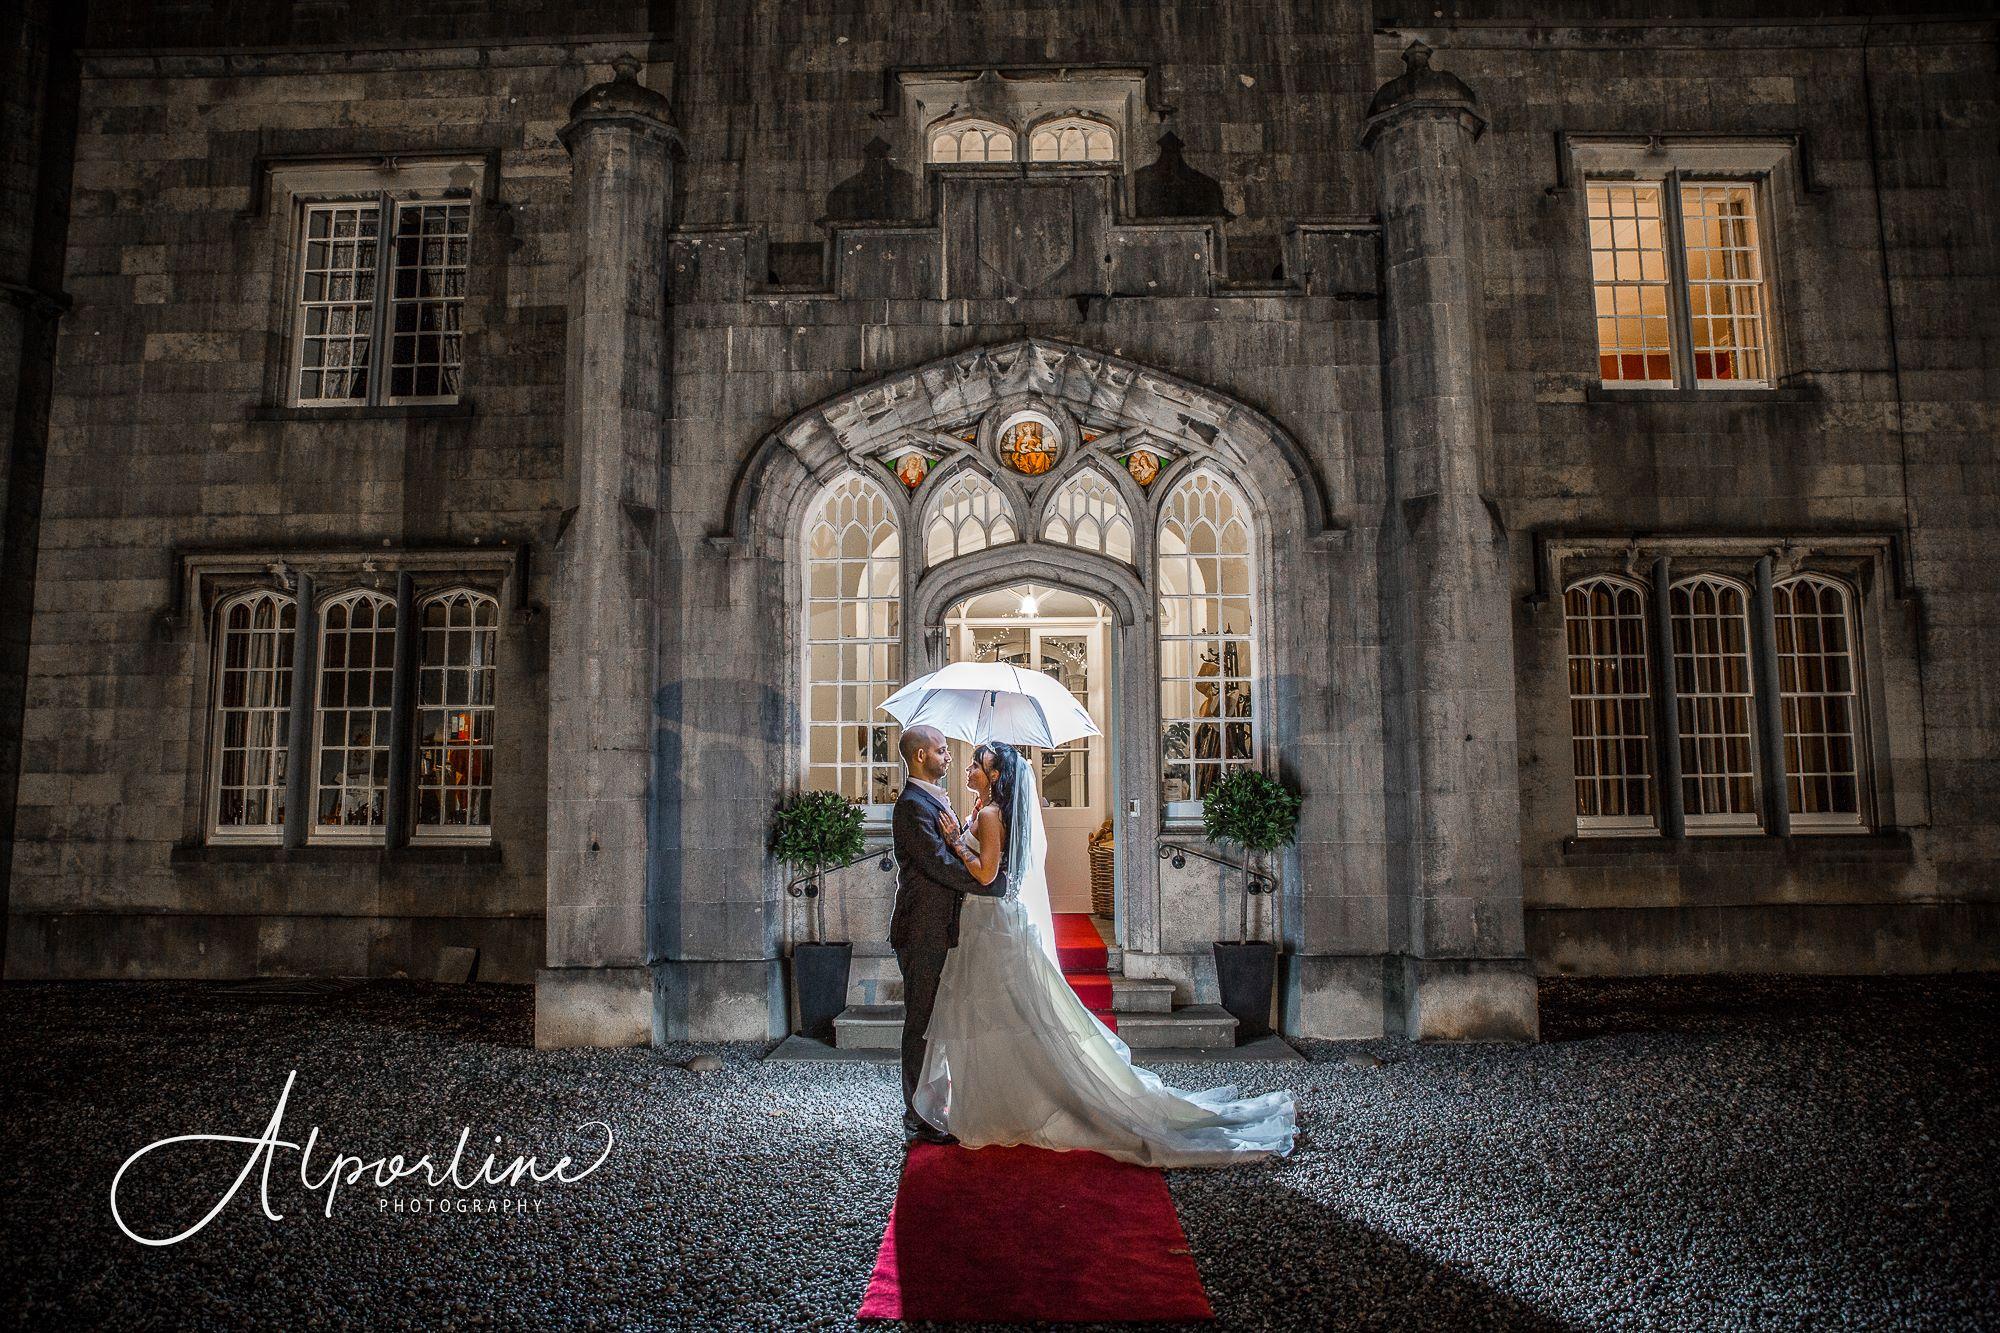 Leighton-hall-wedding-photograph-carnforth-wedding-photographer.jpg